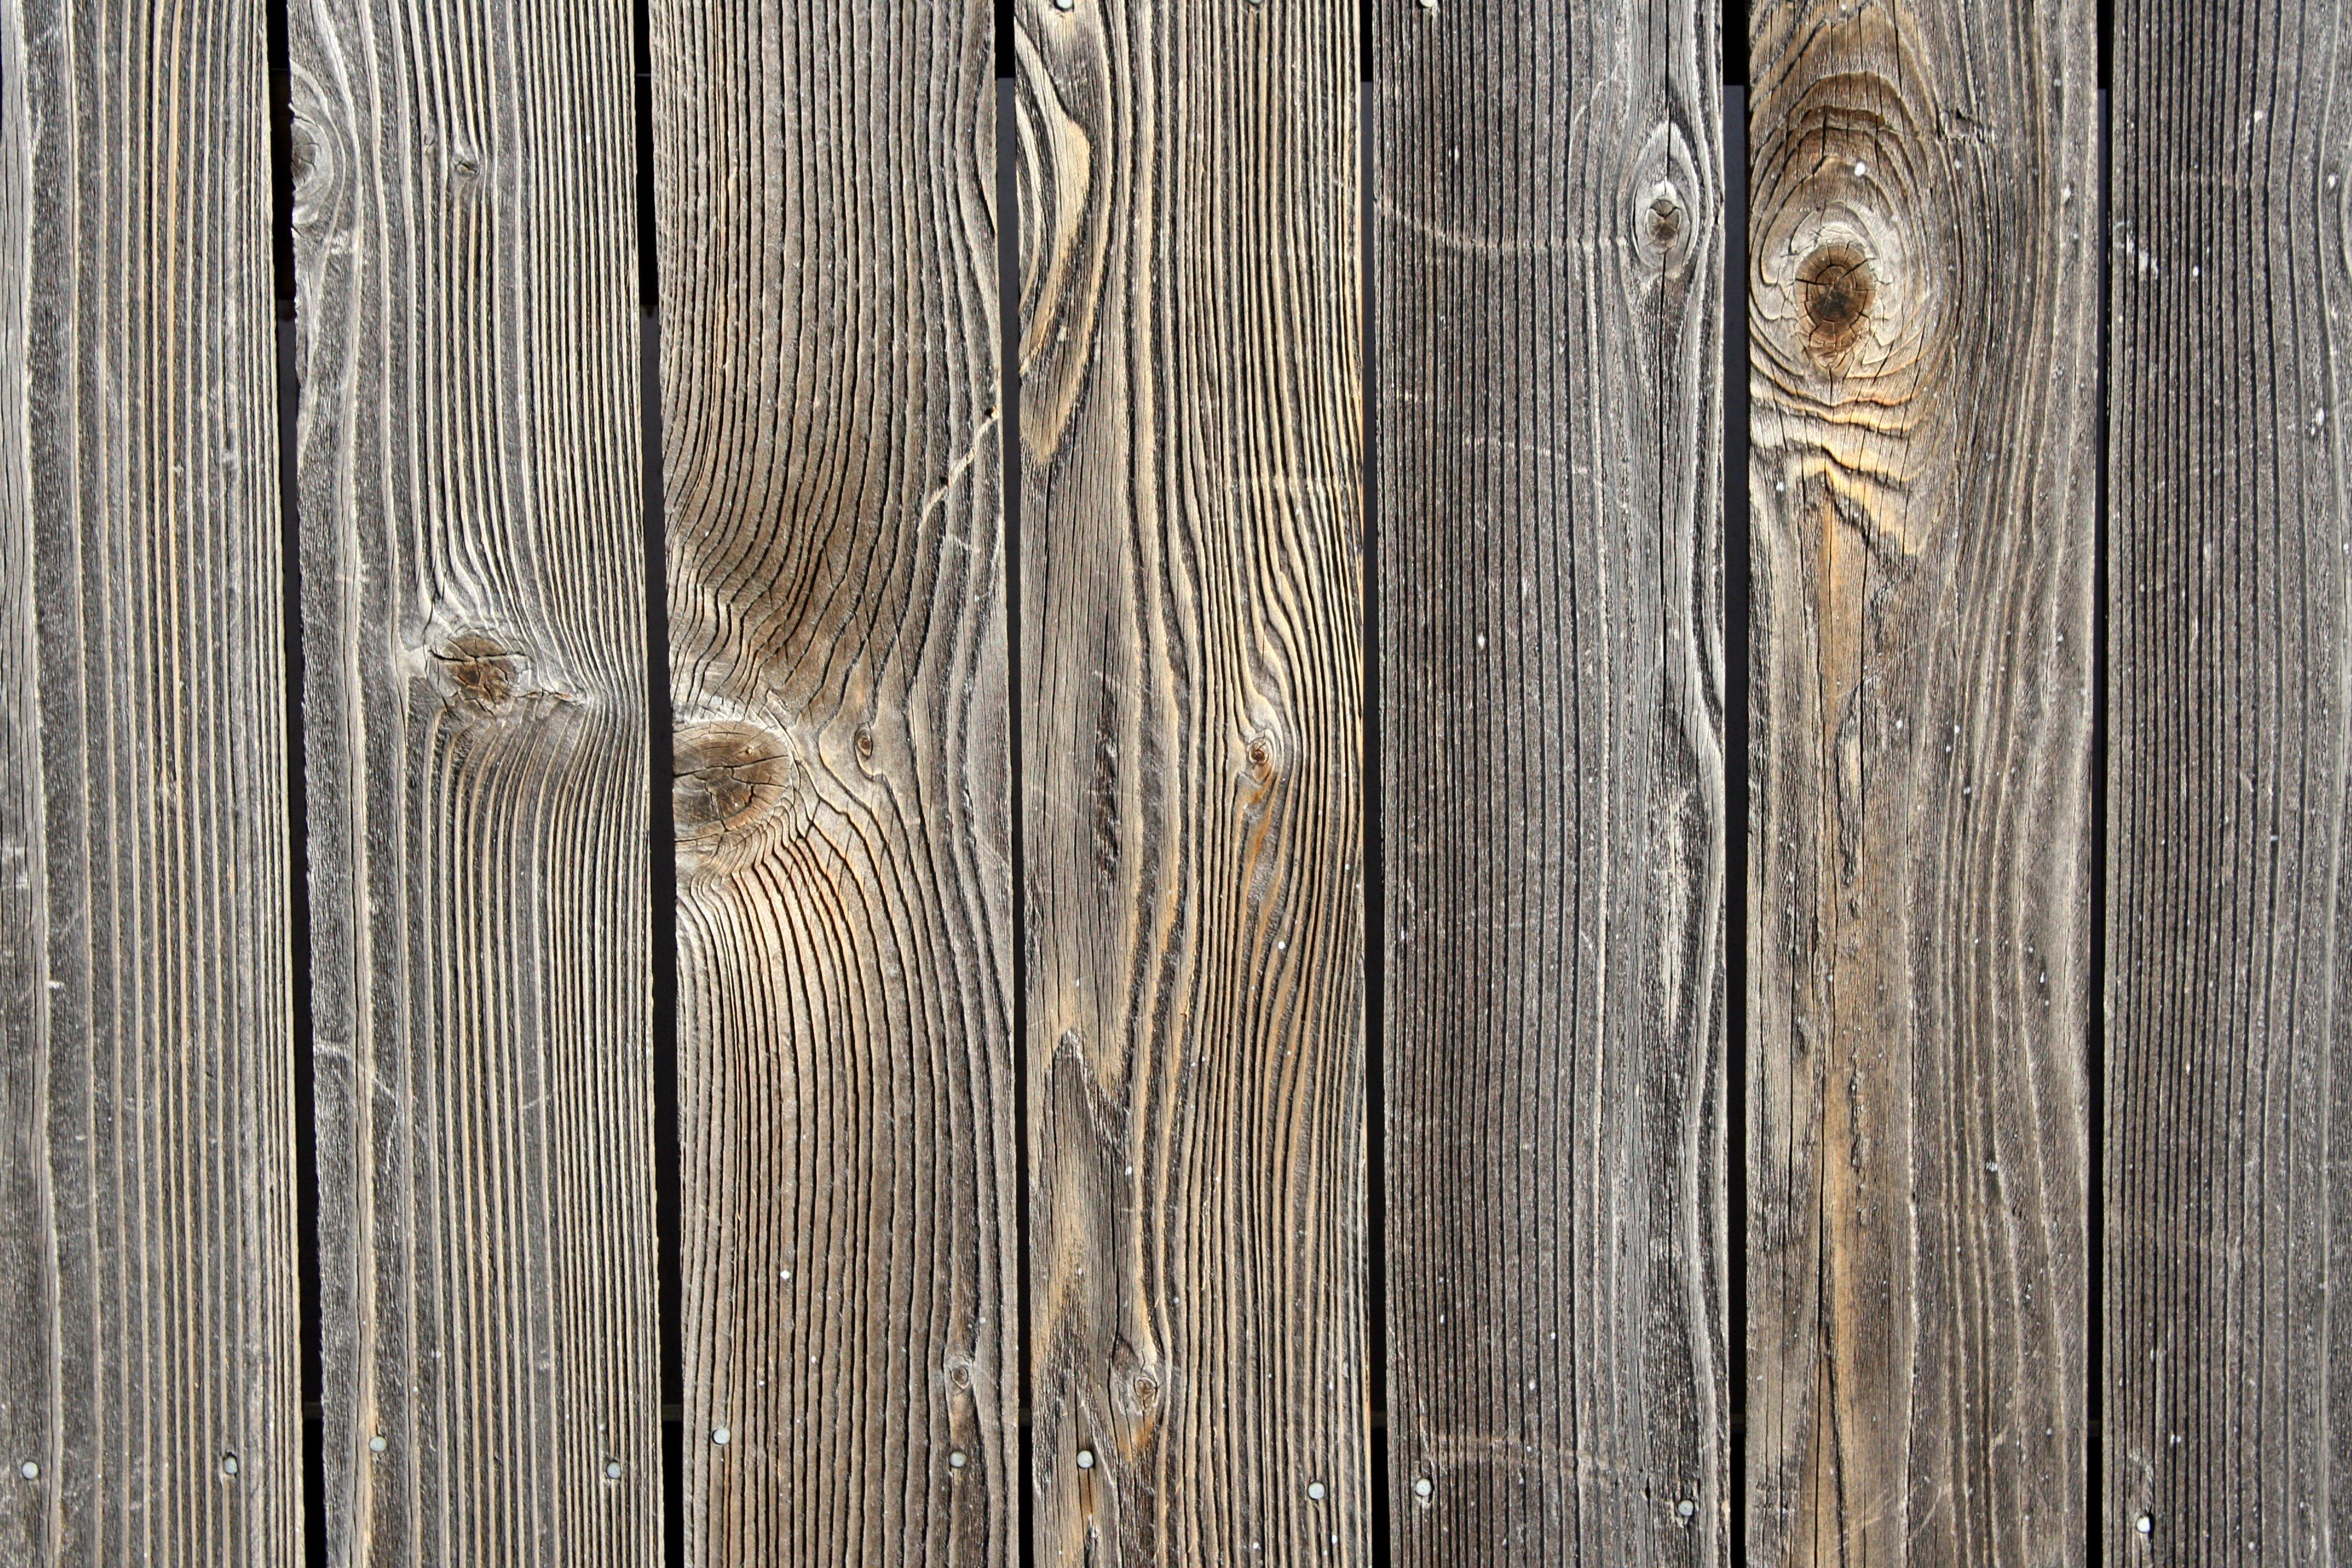 Barn Board   Wallpaper Cool HD 3888x2592